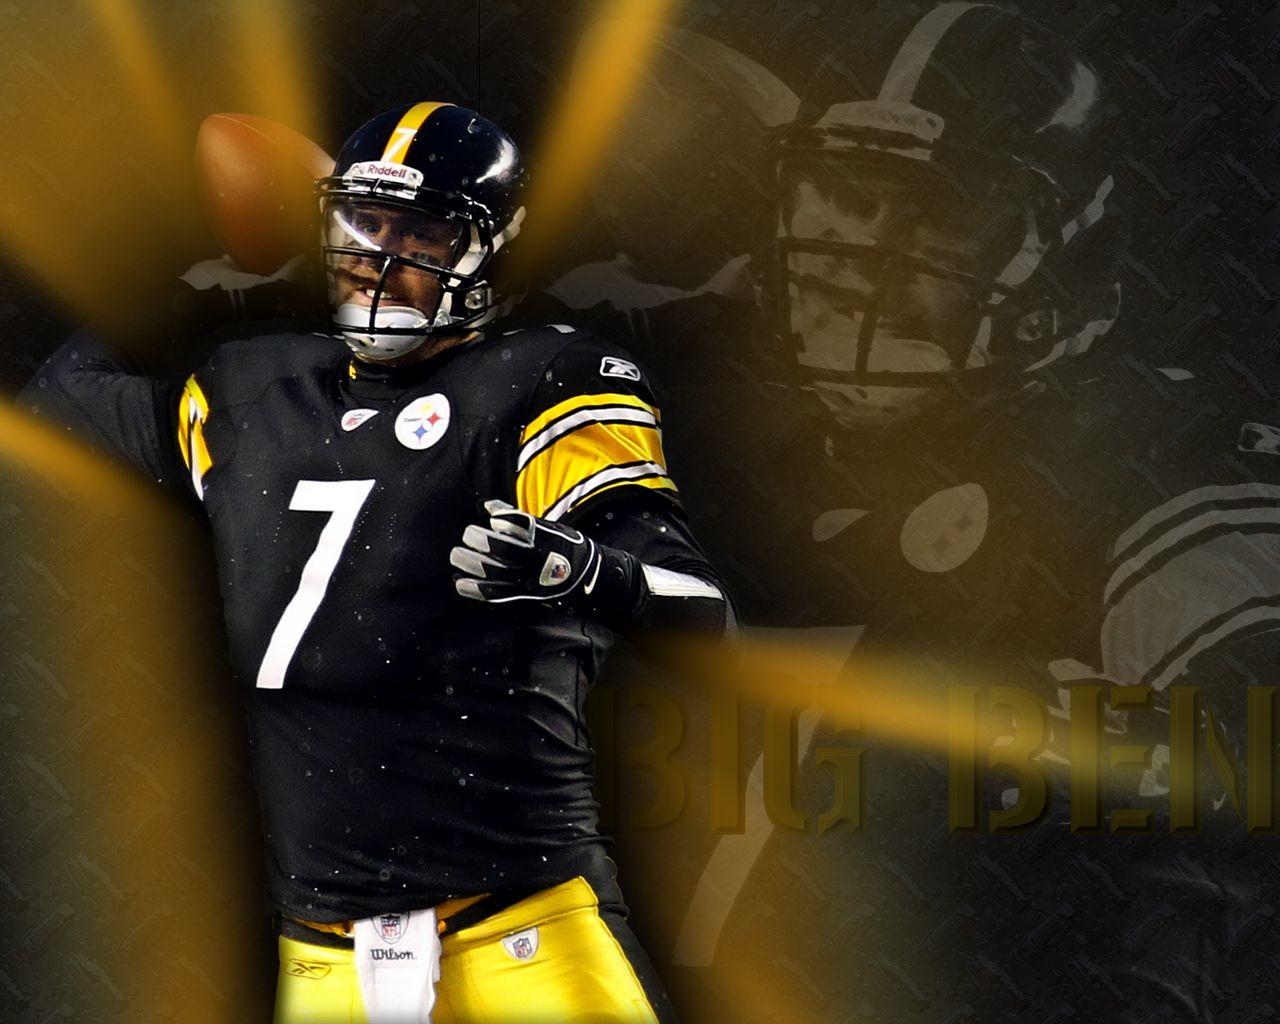 timeless design 36947 05854 Steelers #7 Ben Roethlisberger Limited jerseys   Pittsburgh ...